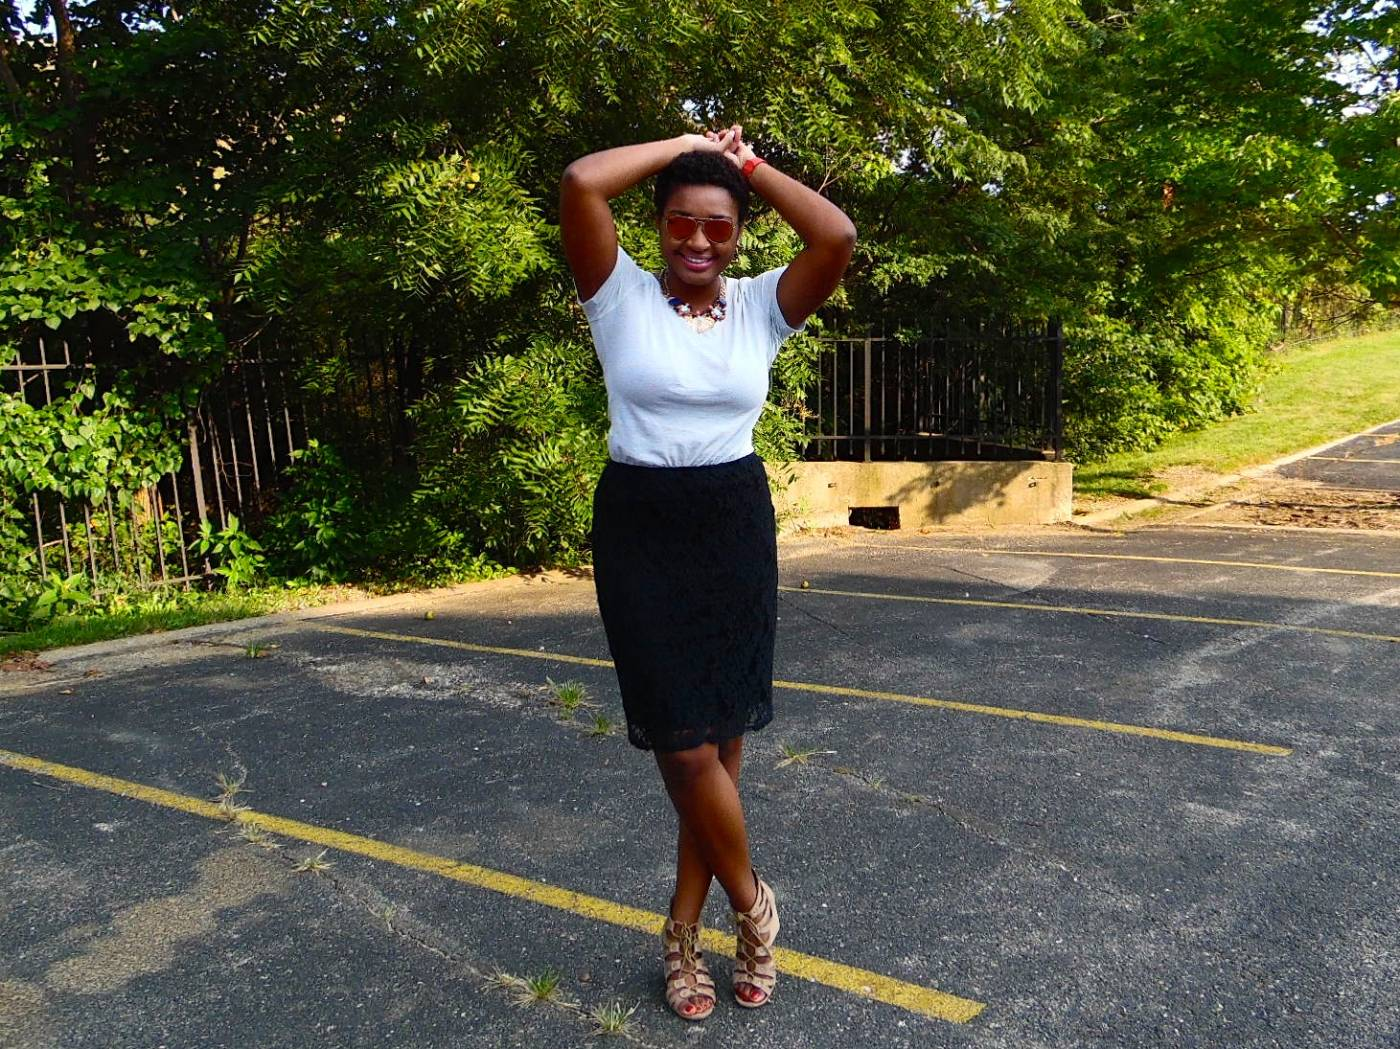 jasmine diane- T-shirt + Lace Pencil Skirt